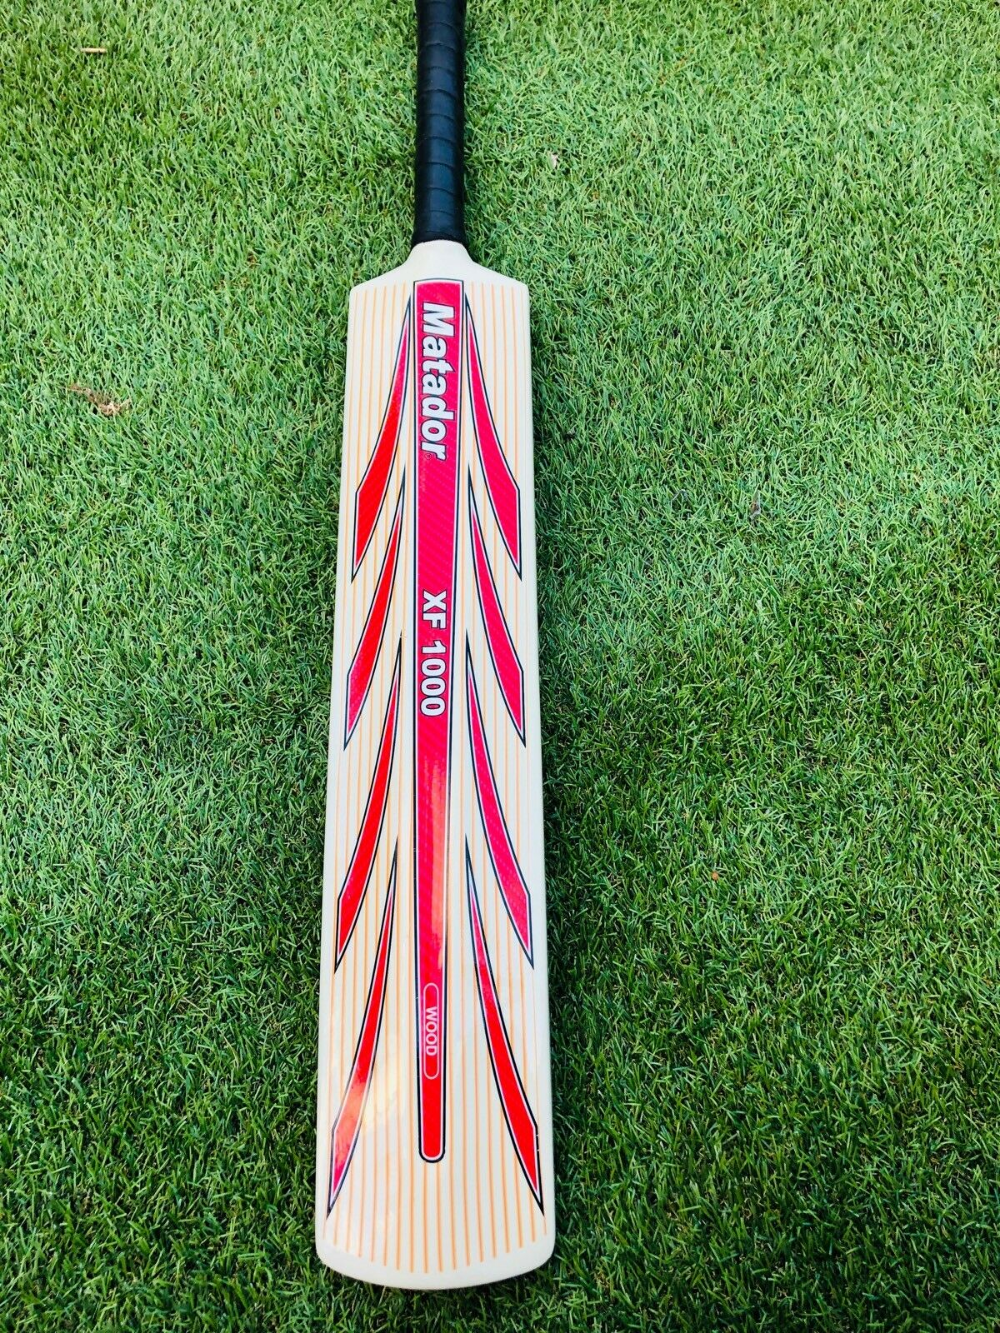 Matador Fiber Wood Cricket Bat Tape Ball Tennis Ball Bat Uk Seller Ebay Nel 2020